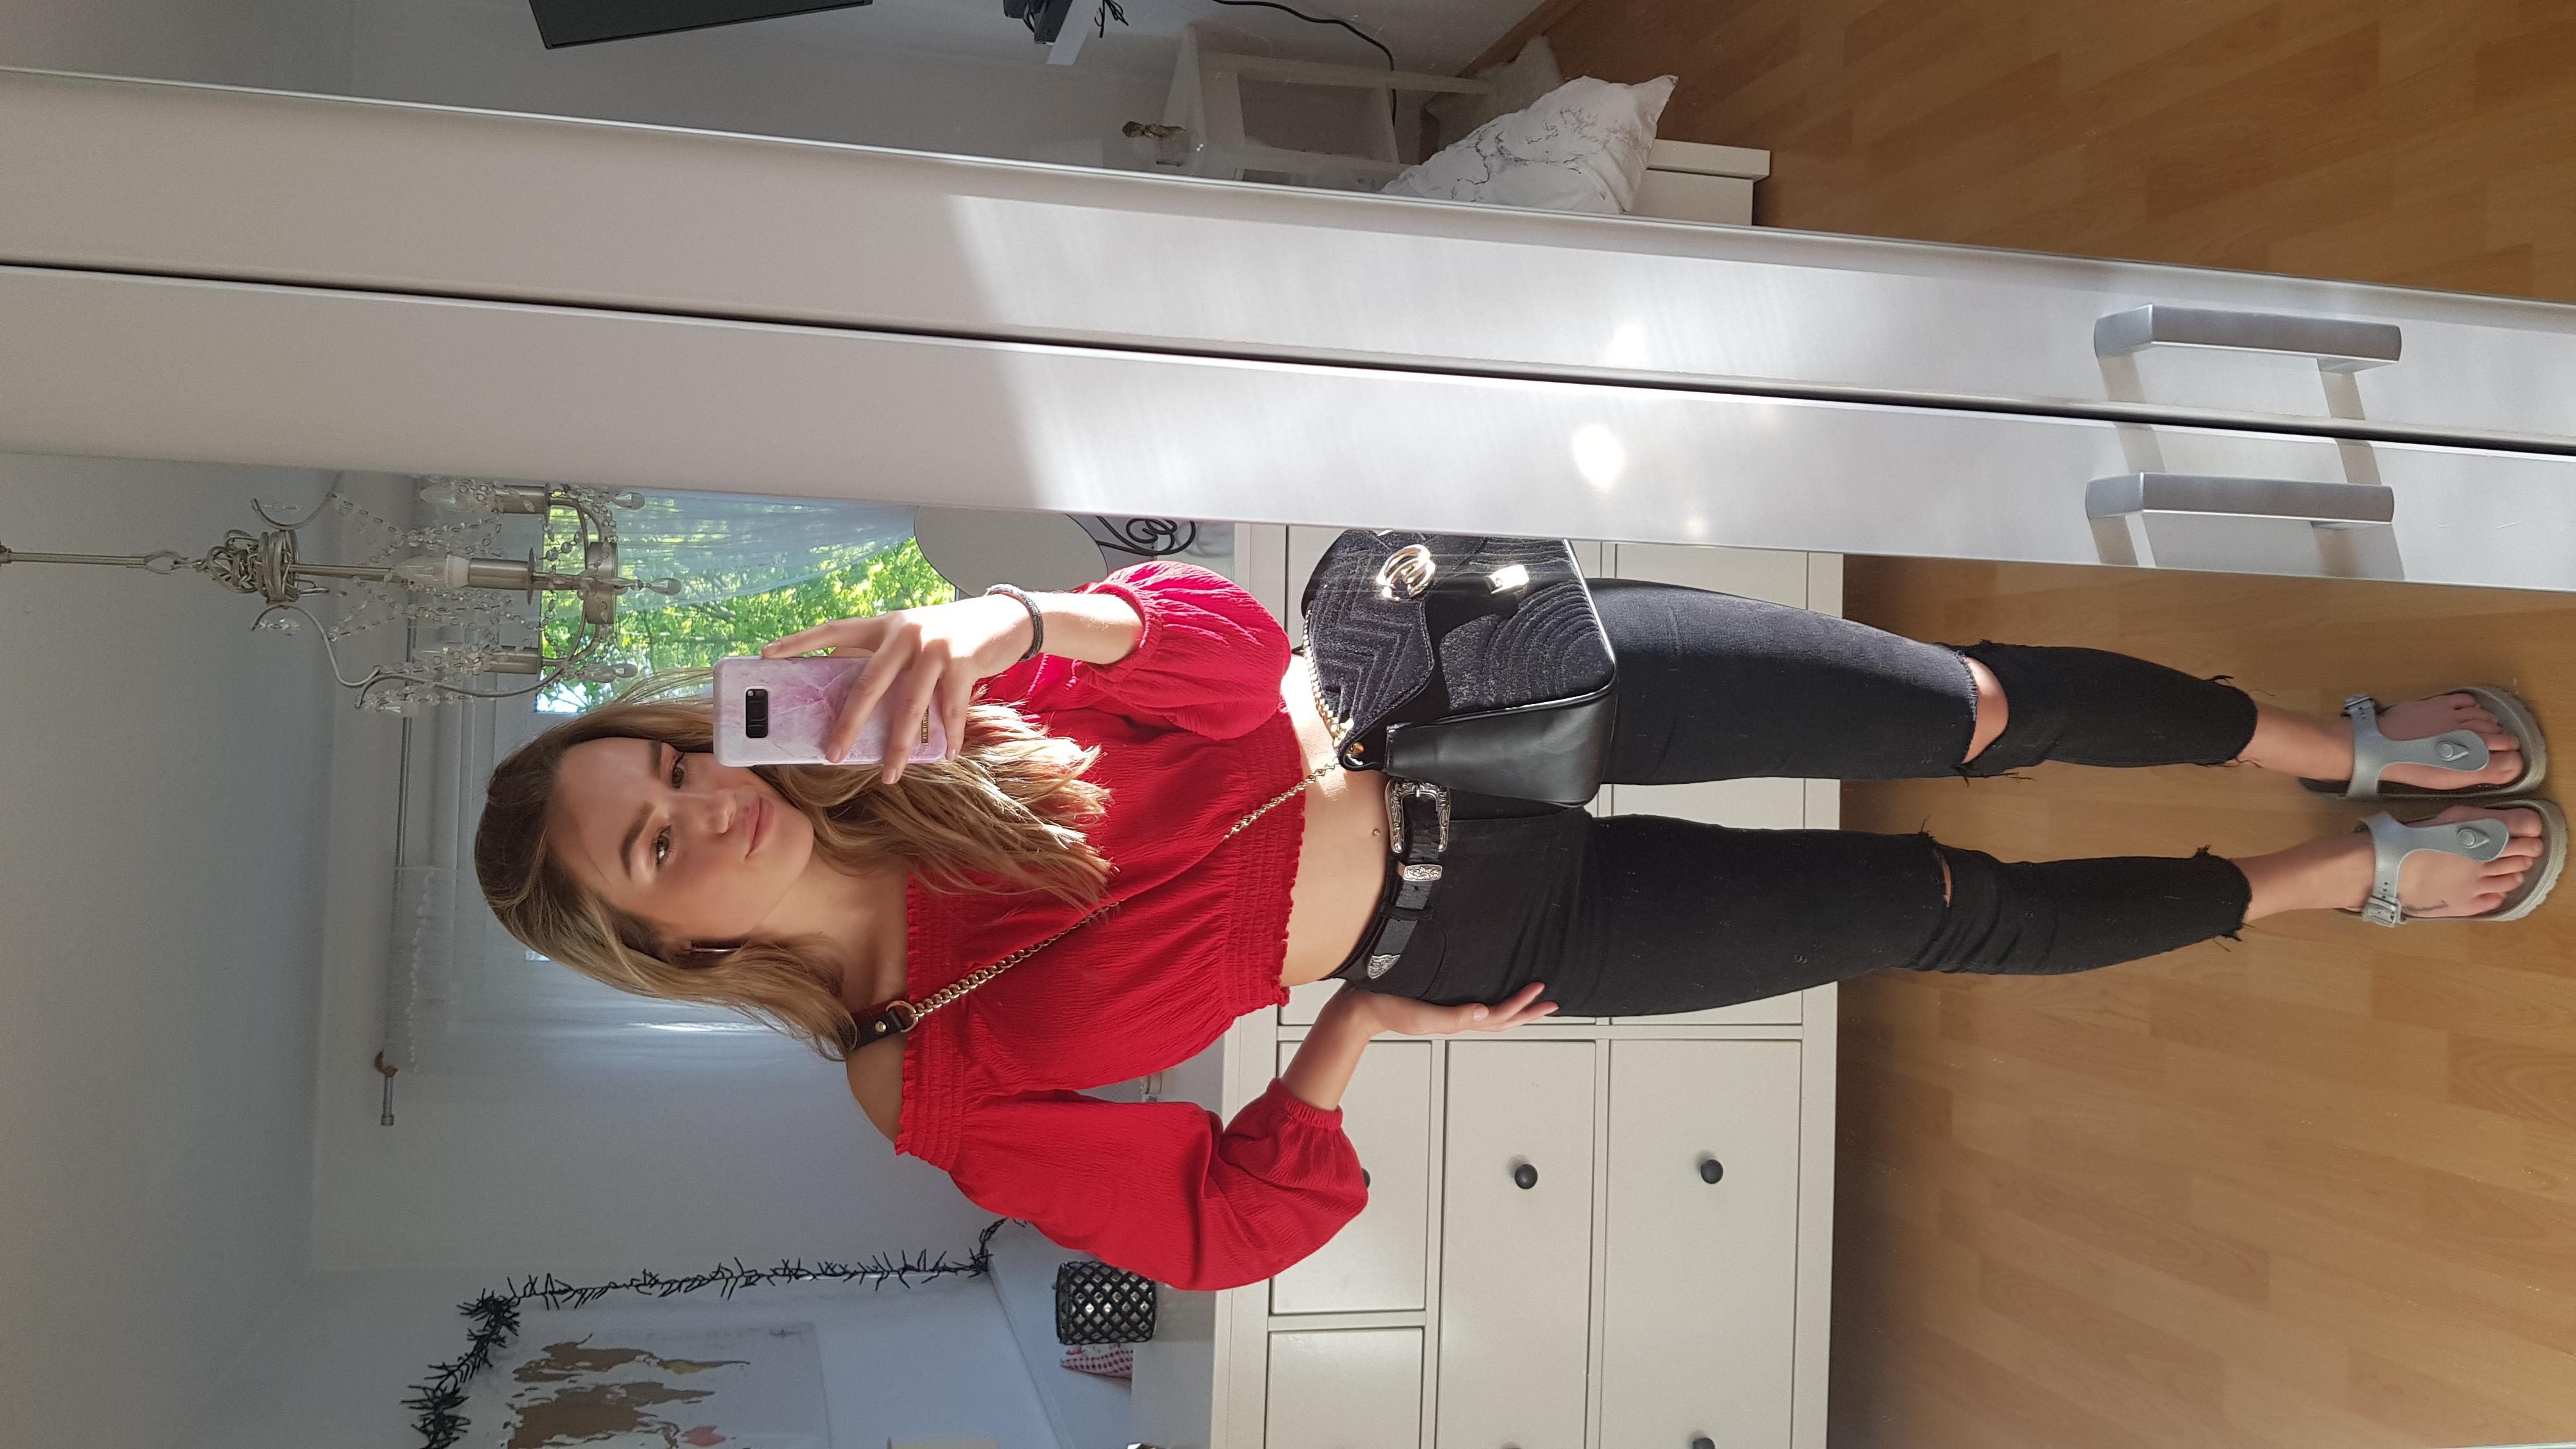 Hostess Anna aus Bochum, Konfektion 36, Studium